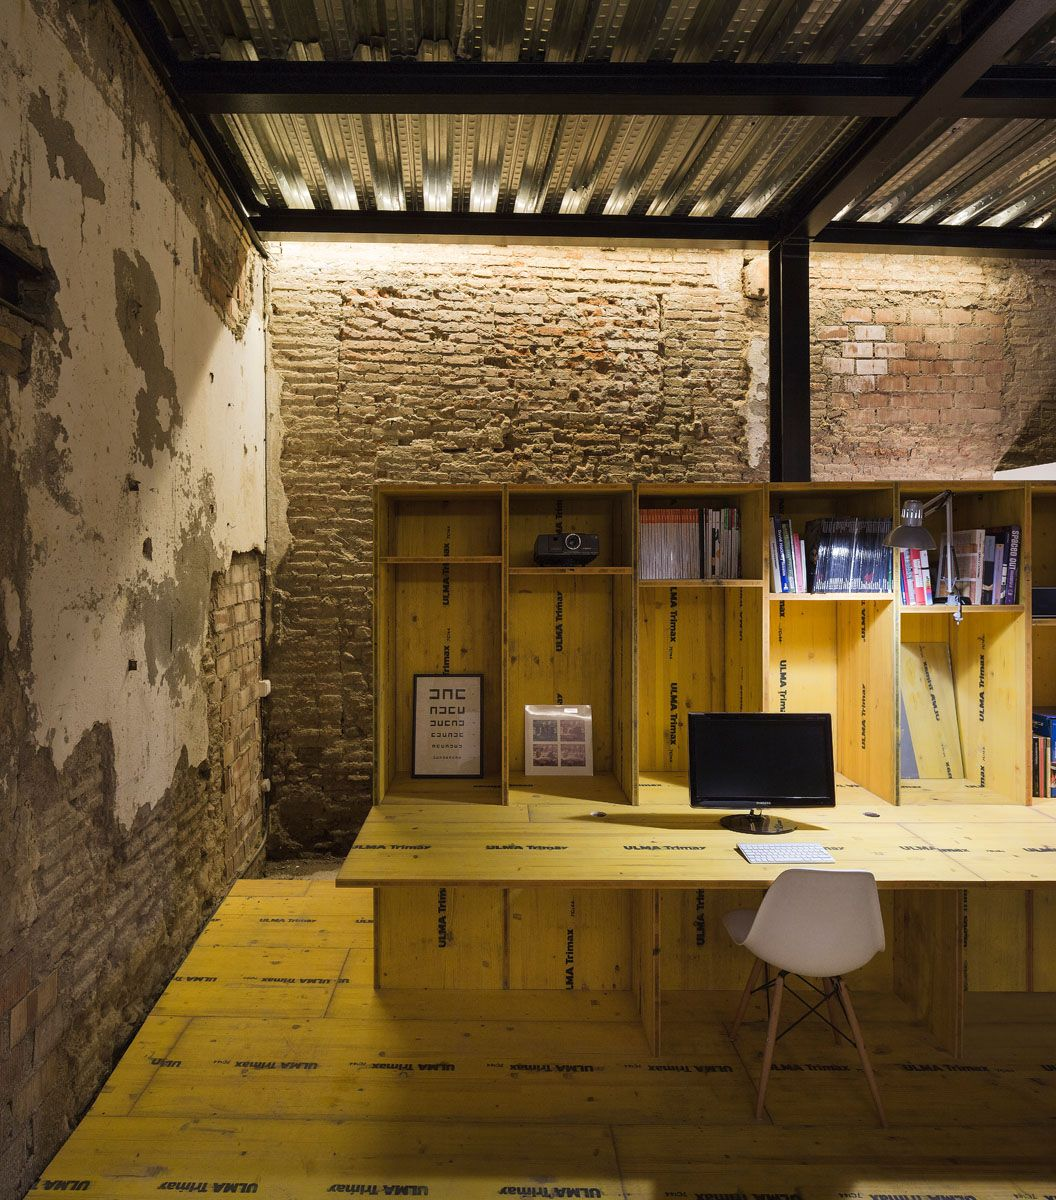 CUAC Arquitectura   Project   SAN JERÓNIMO 17. REFORMA DE LOCAL PARA  OFICINA TALLER   Image 6. Industrial WorkspaceIndustrial StyleSt ...